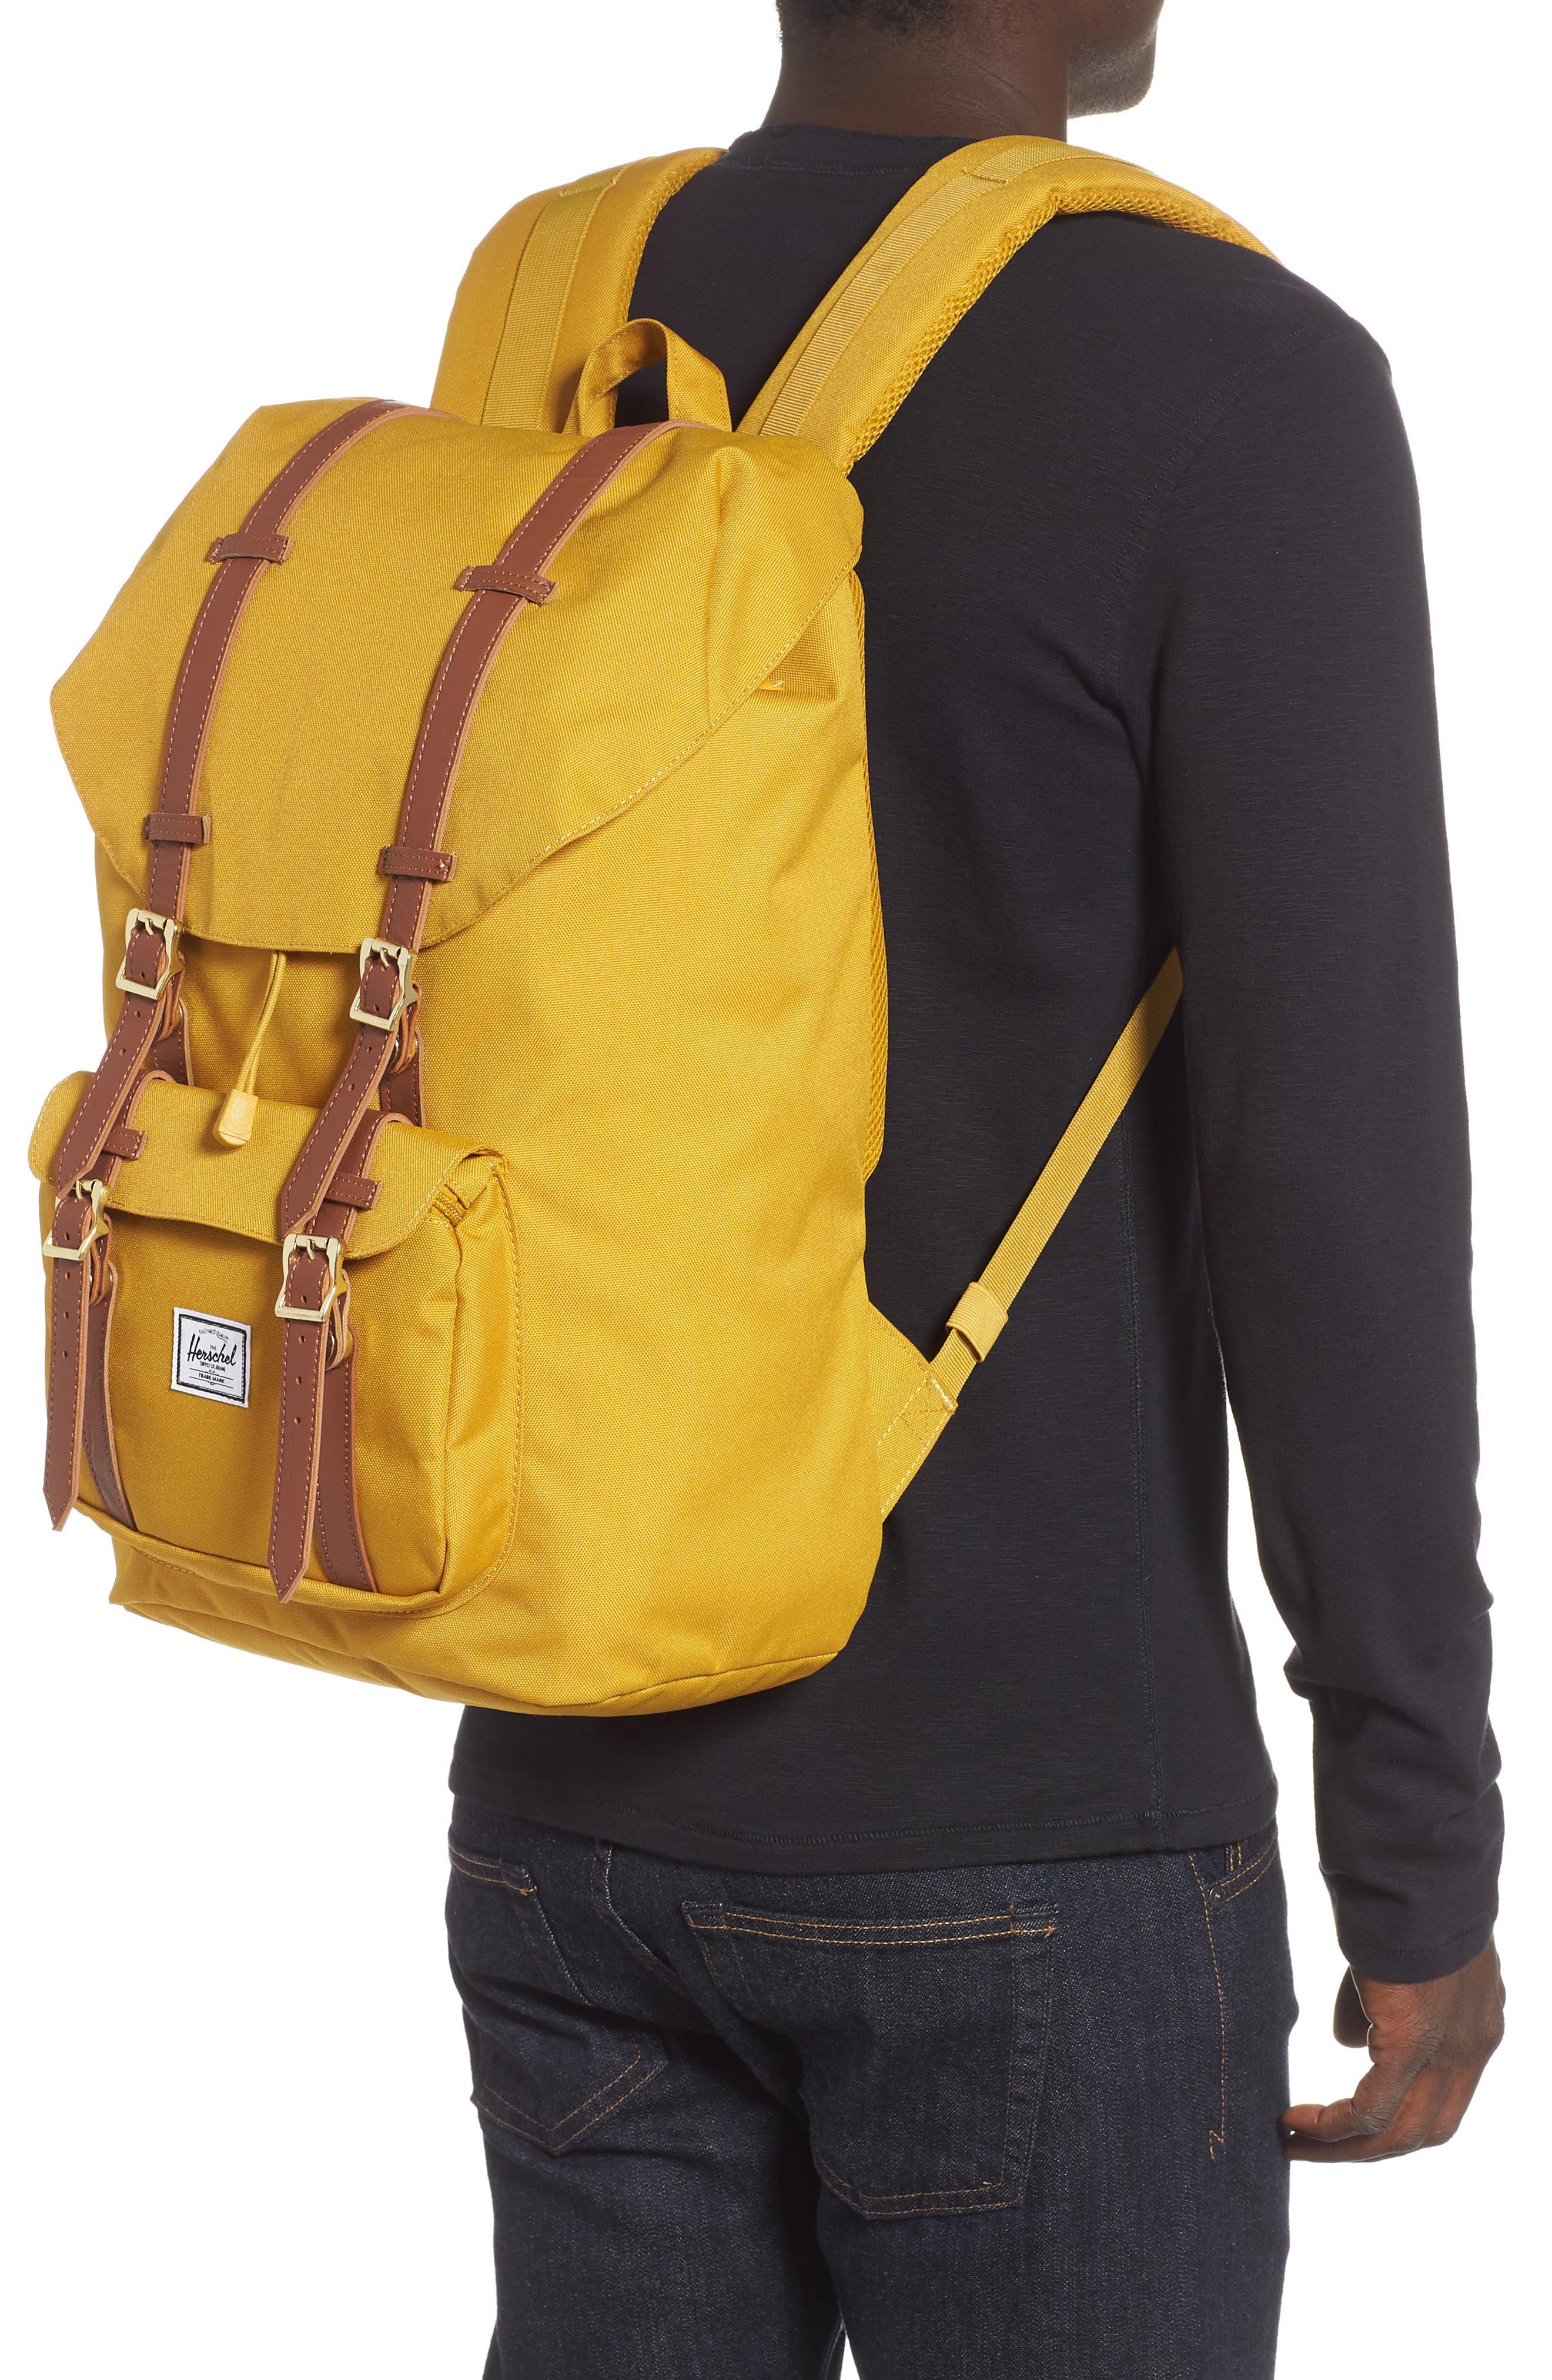 Little America Backpack,                             Alternate thumbnail 2, color,                             ARROW WOOD/ TAN LEATHER